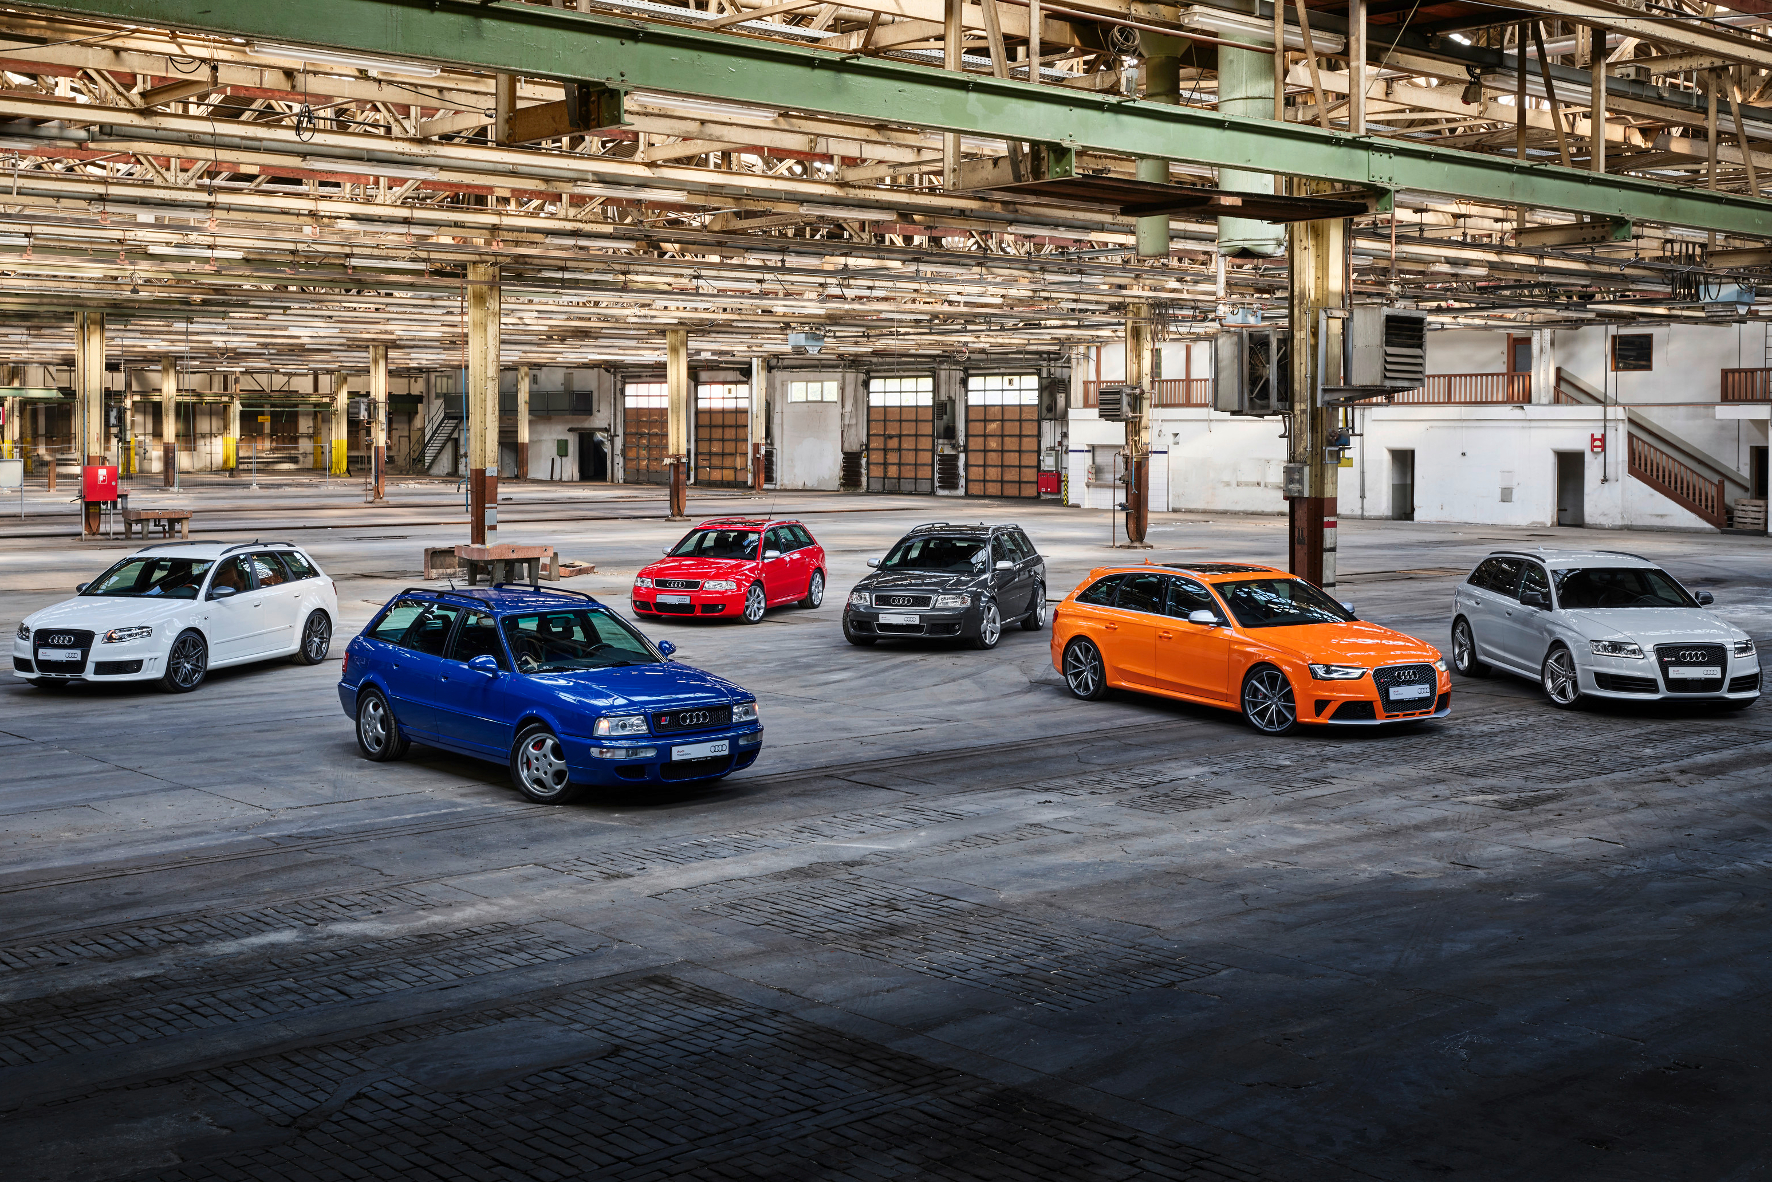 mid Groß-Gerau - Sportliche Sammlung: von links nach rechts Audi RS 4 Avant (Typ B7), Audi RS 2 Avant, Audi RS 4 Avant (Typ B5), Audi RS 6 Avant (Typ C5), Audi RS 4 Avant (Typ B8), Audi RS 6 Avant (Typ C6). Audi